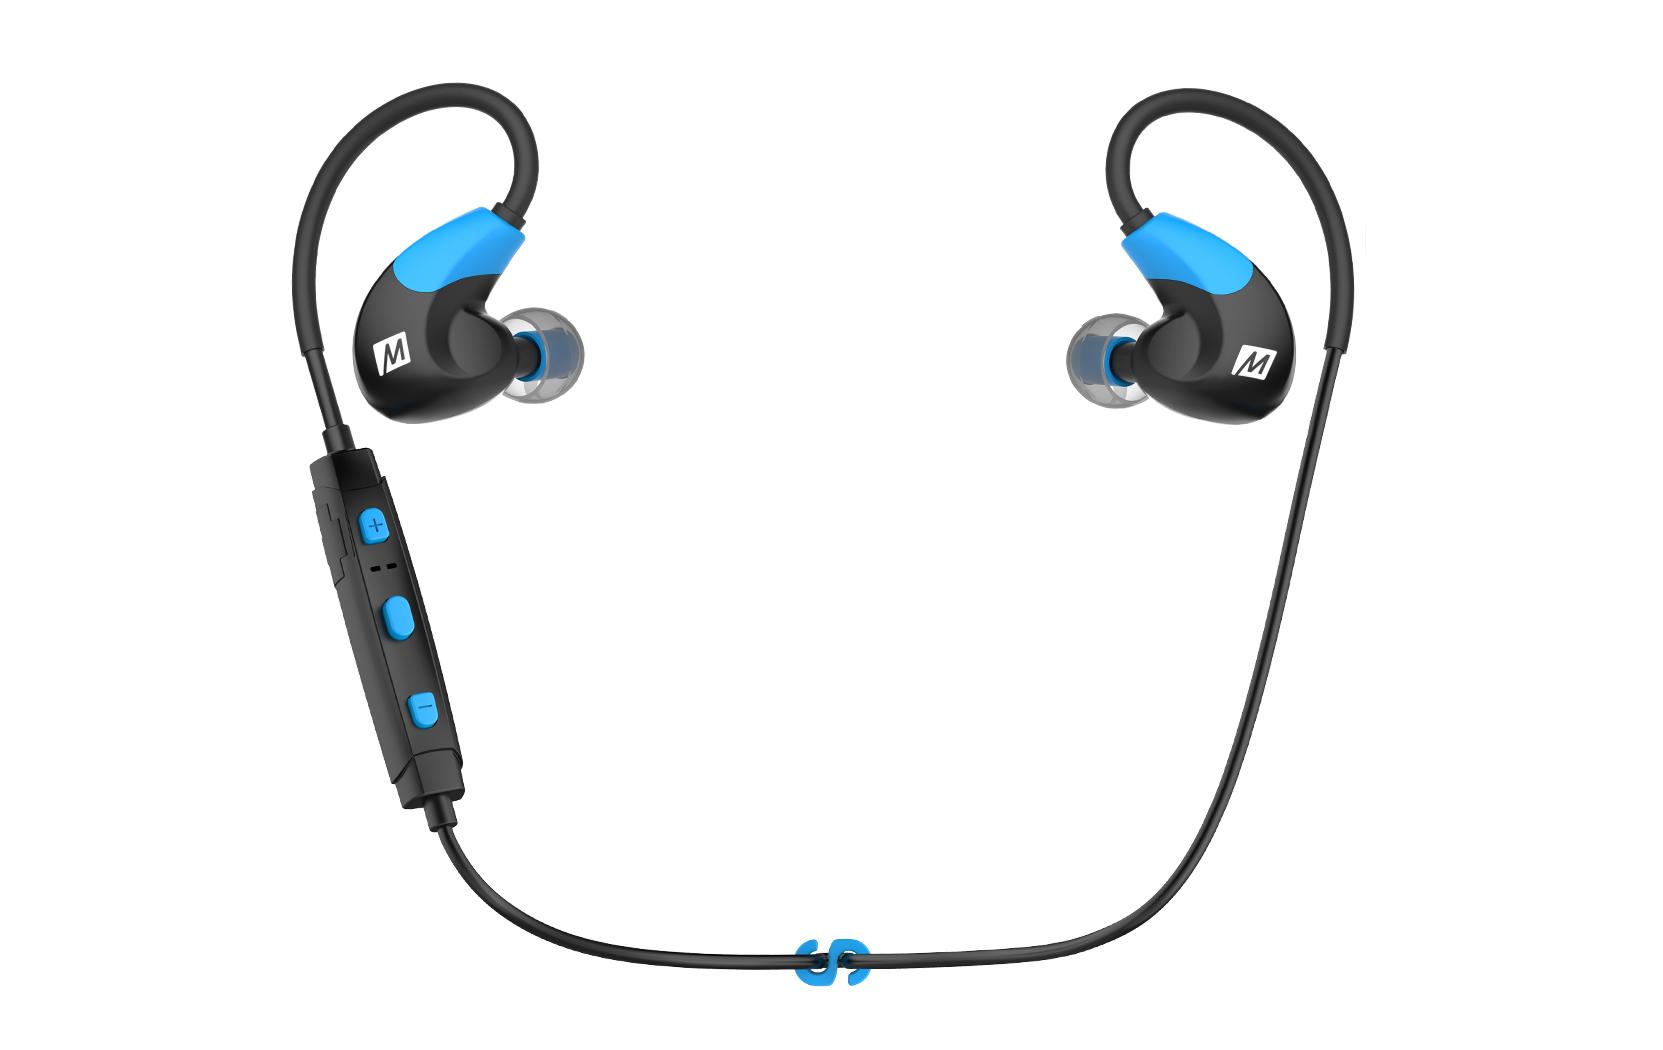 Mee Audio X7 STEREO BLUETOOTH BEVIELĖS SPORTO IN-EAR AUSINĖS (BLUE)